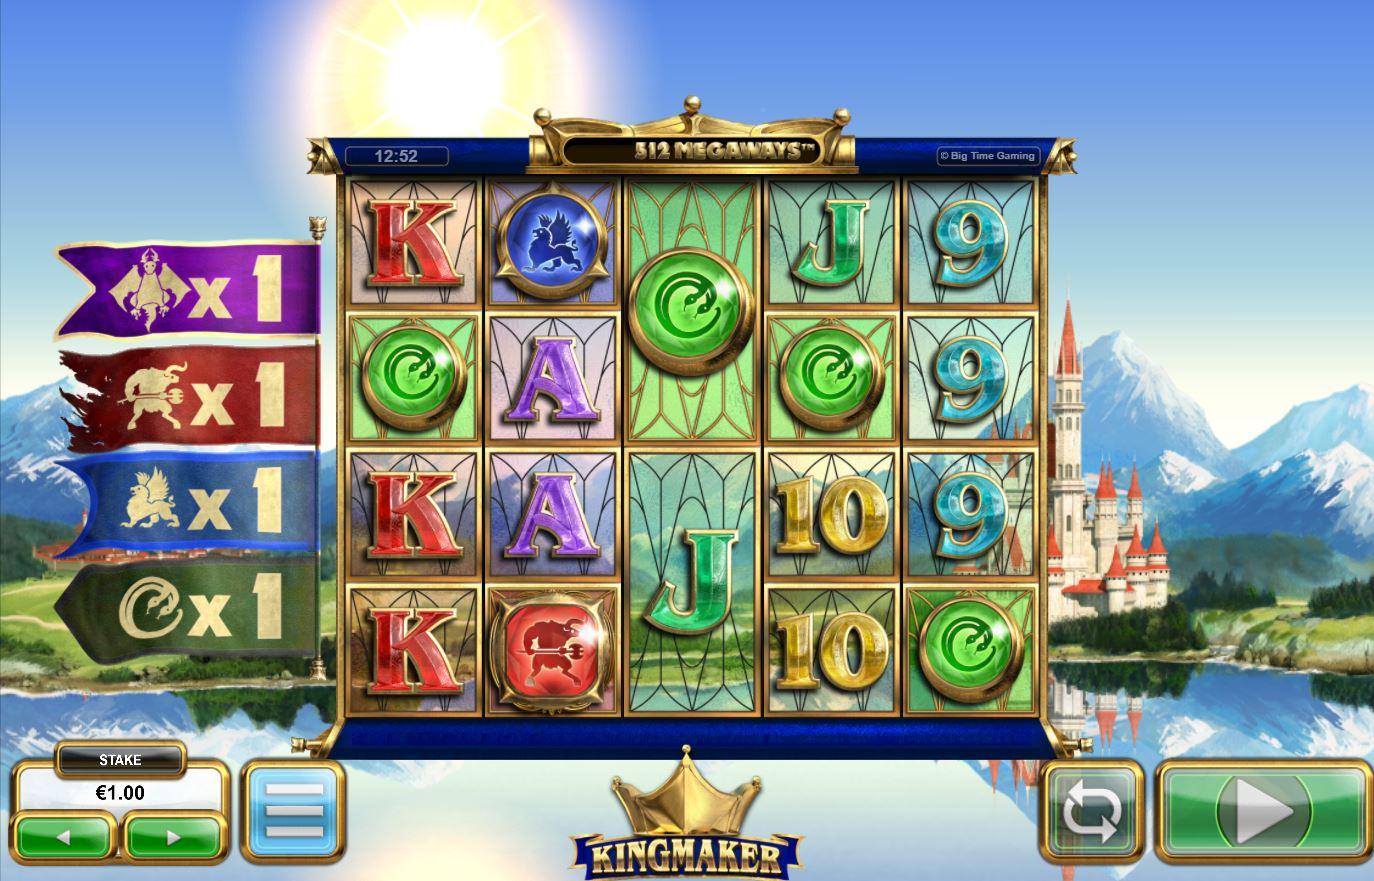 Kingmaker Slot Gameplay